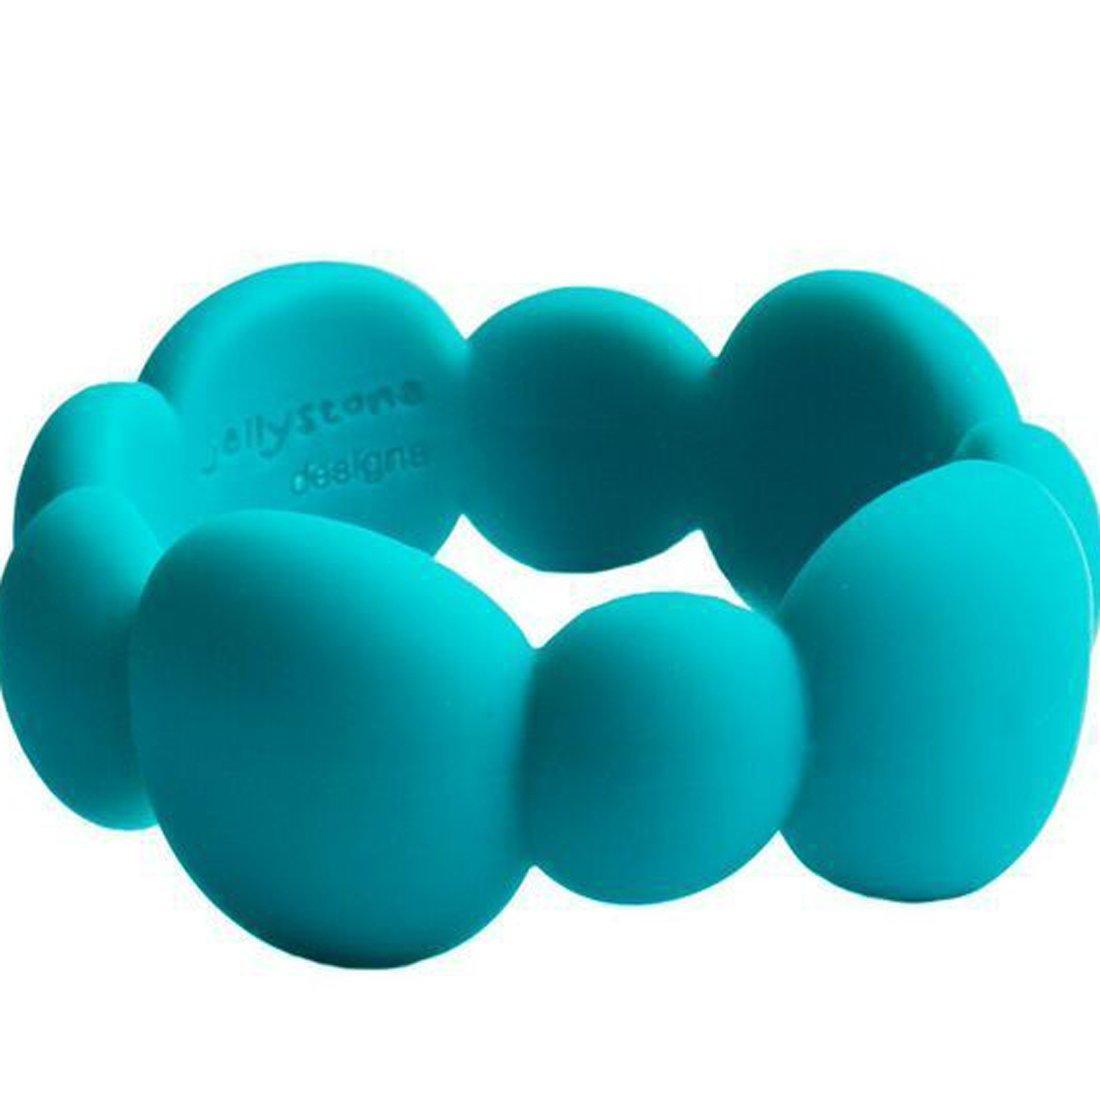 Jellystone Pebble Bangle Blueberry Jellystone Designs